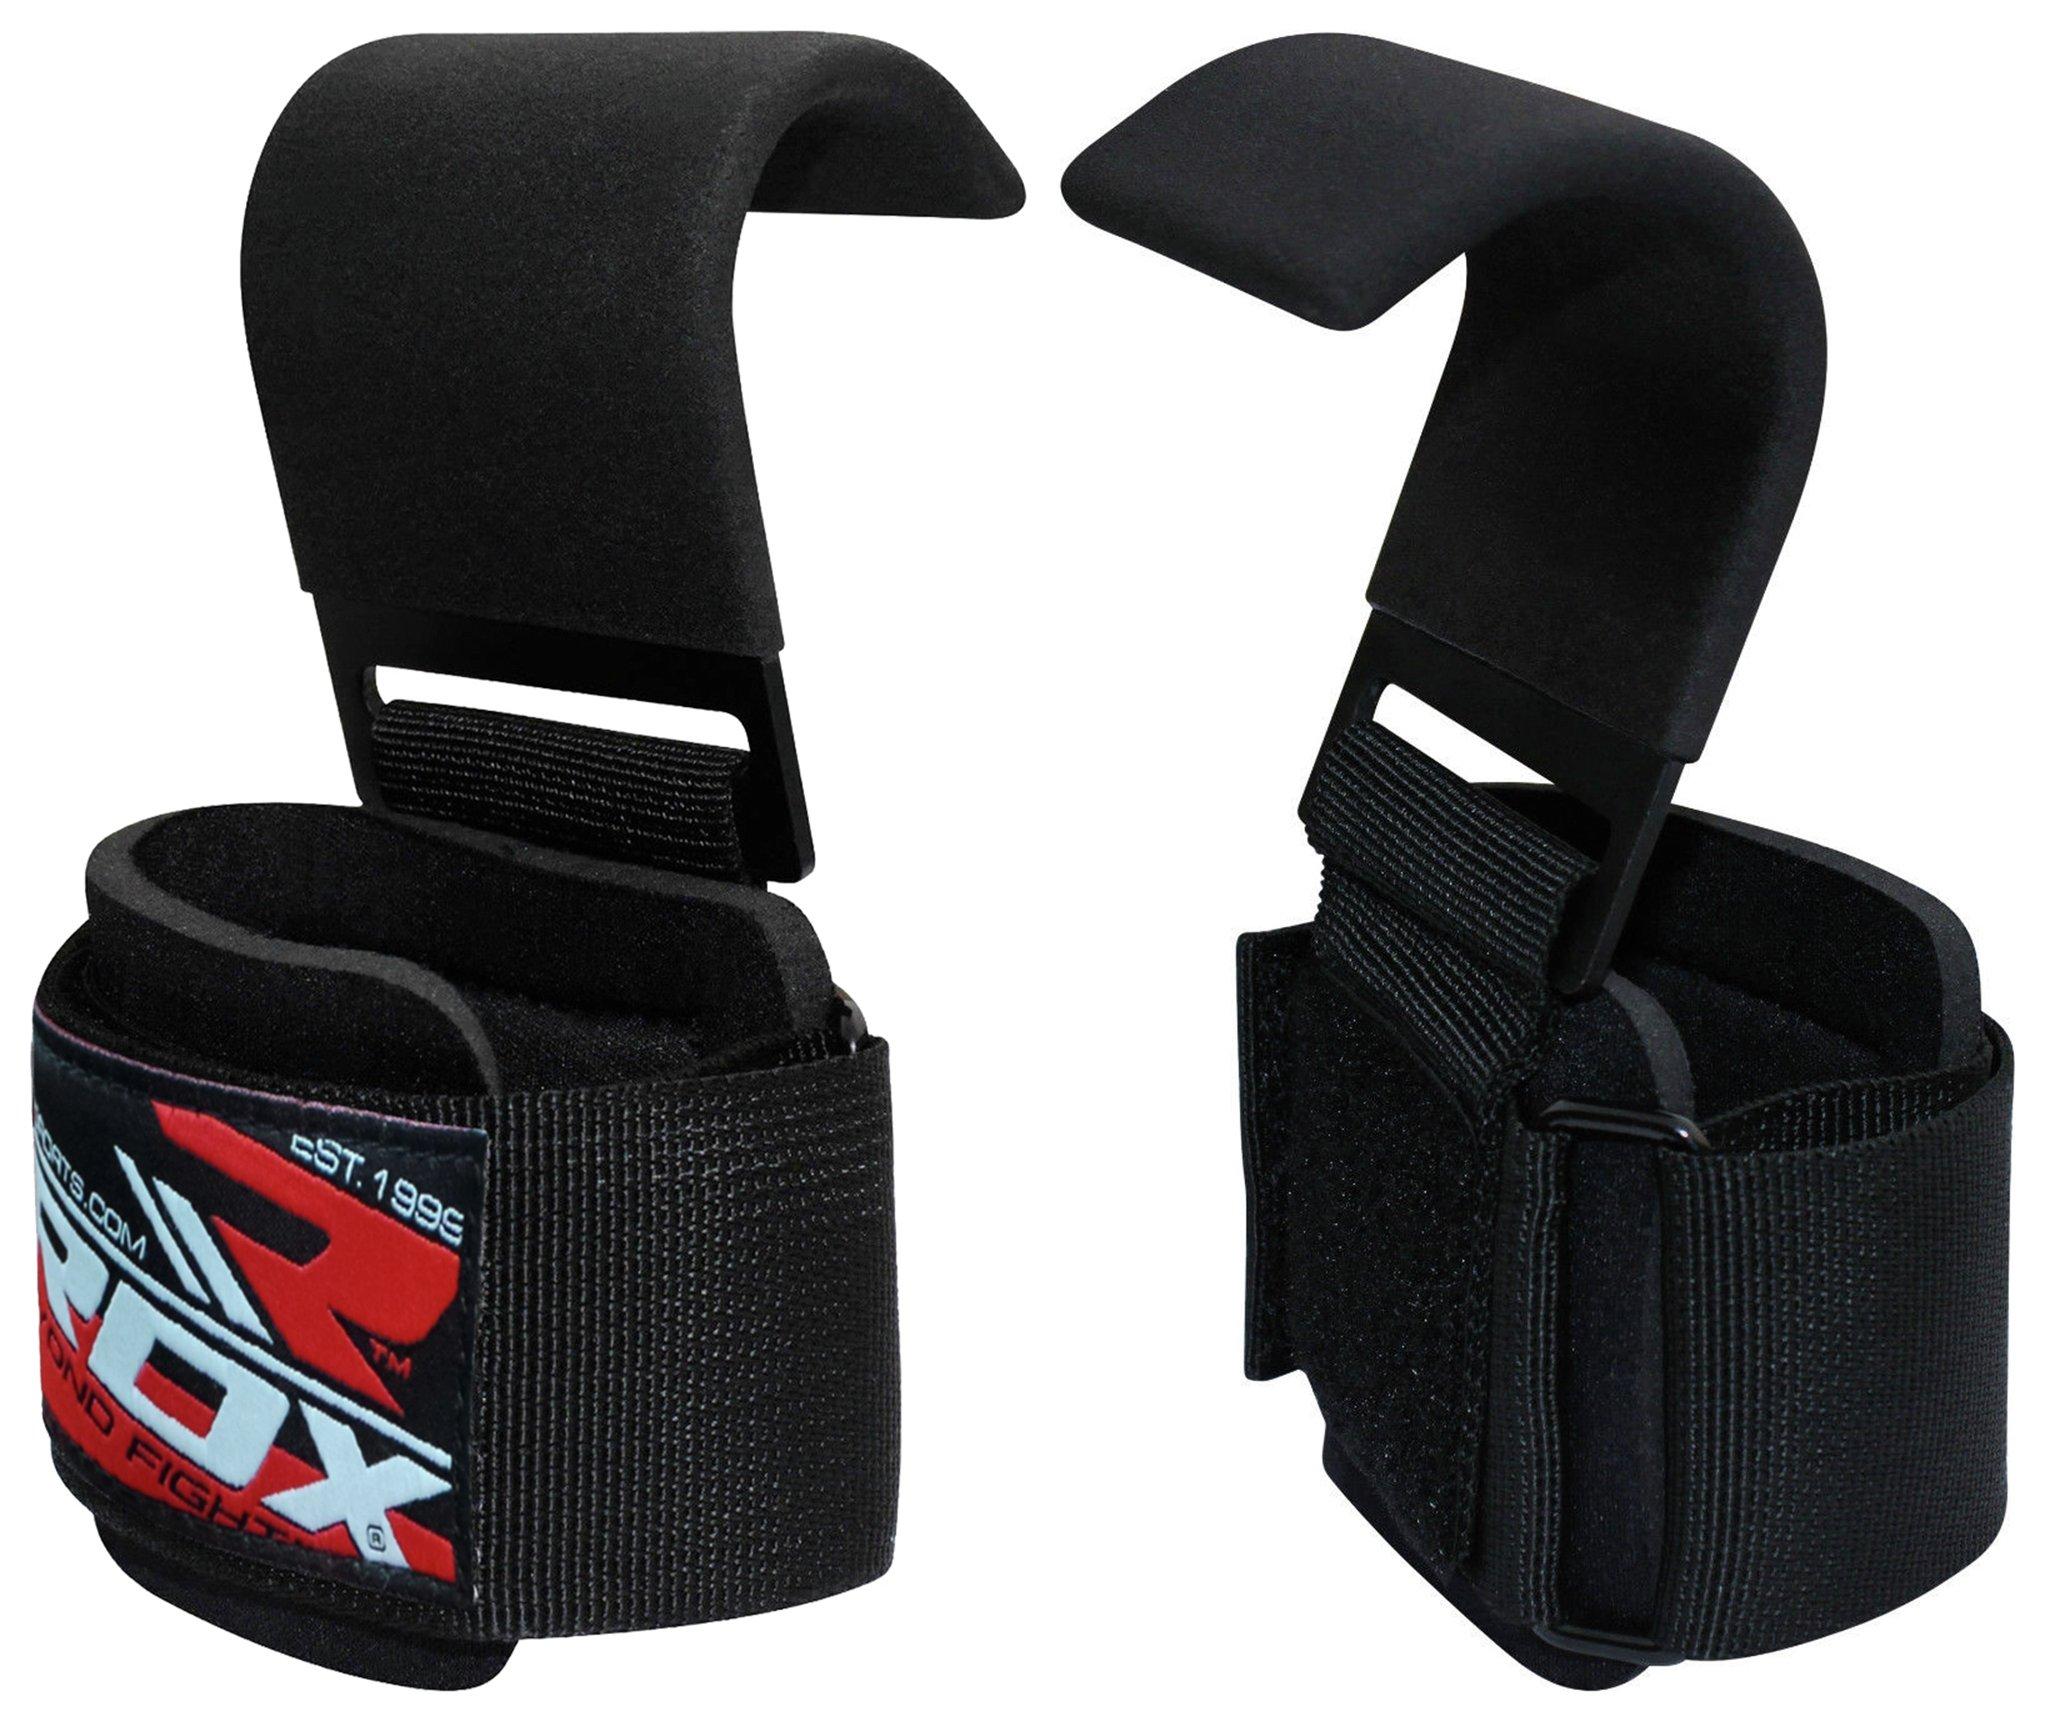 Fitness Gloves Argos: WANA5B Weight Lifting Hook Wrist Strap Review